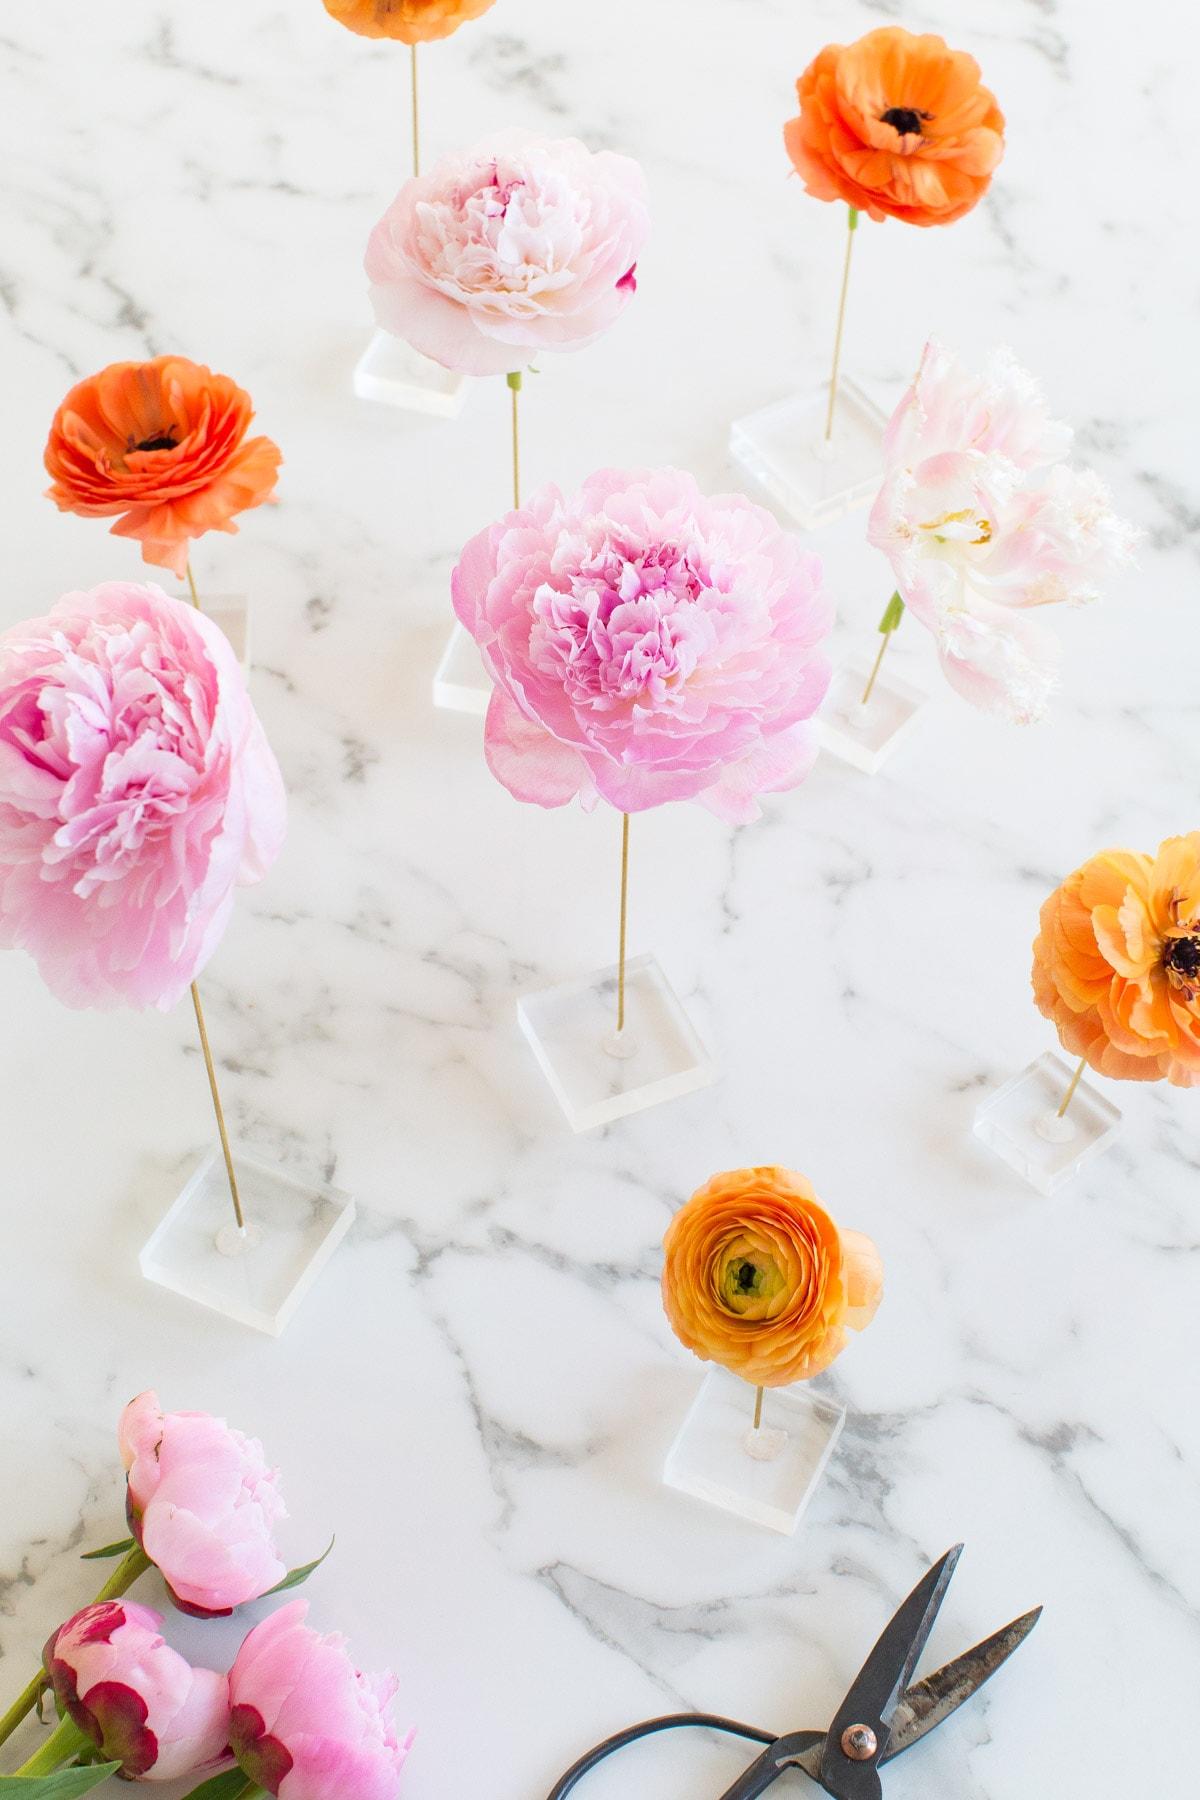 DIY Floating Flower Table Display | Sugar & Cloth